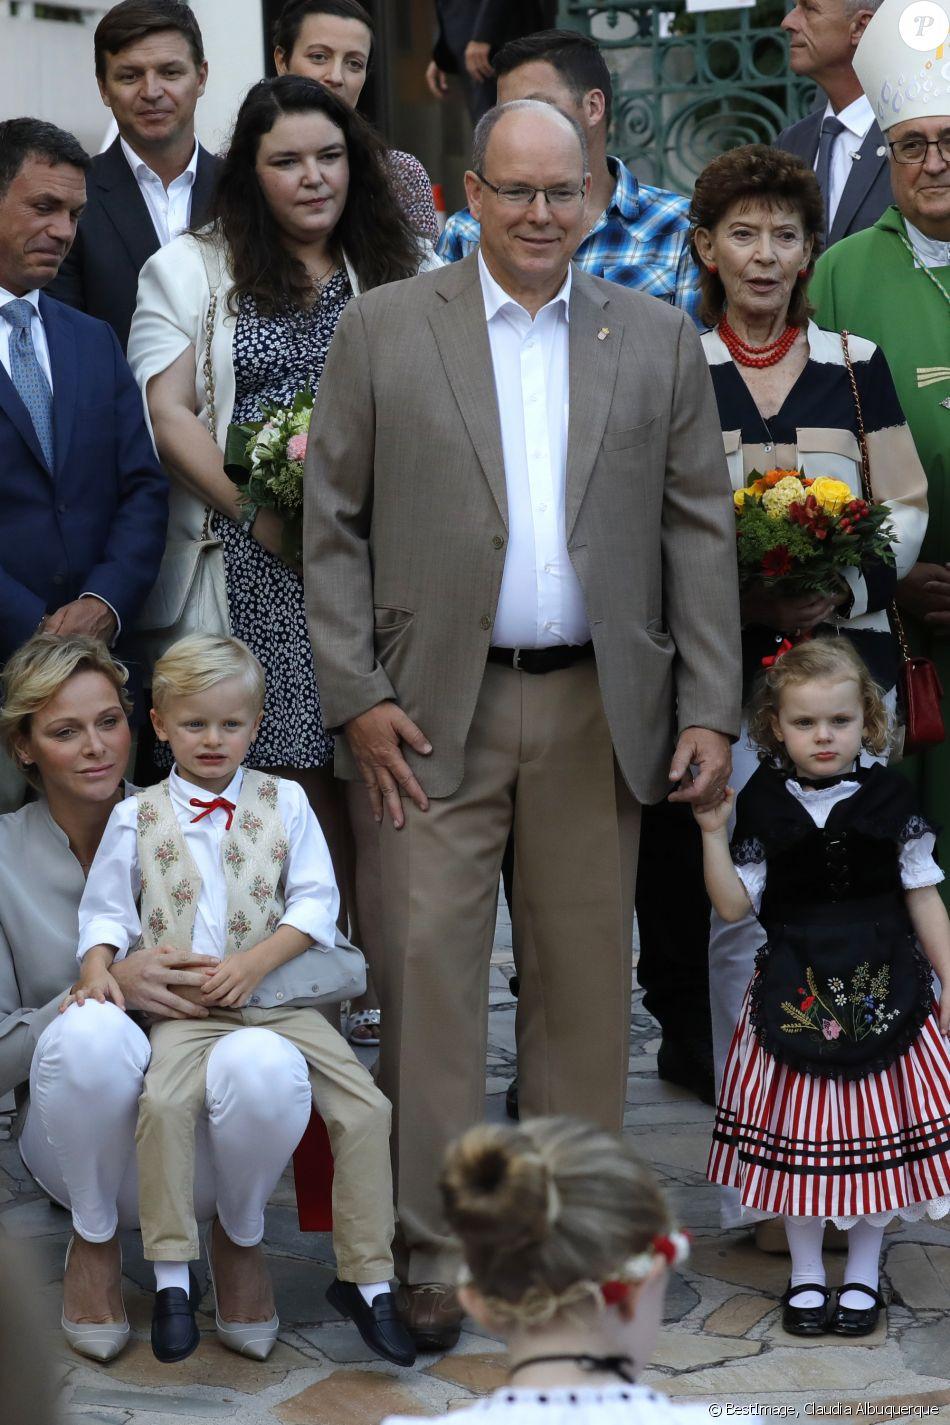 Alberto II y Charlene, Príncipes de Mónaco - Página 11 4280081-gareth-wittstock-et-sean-wittstock-frer-950x0-2